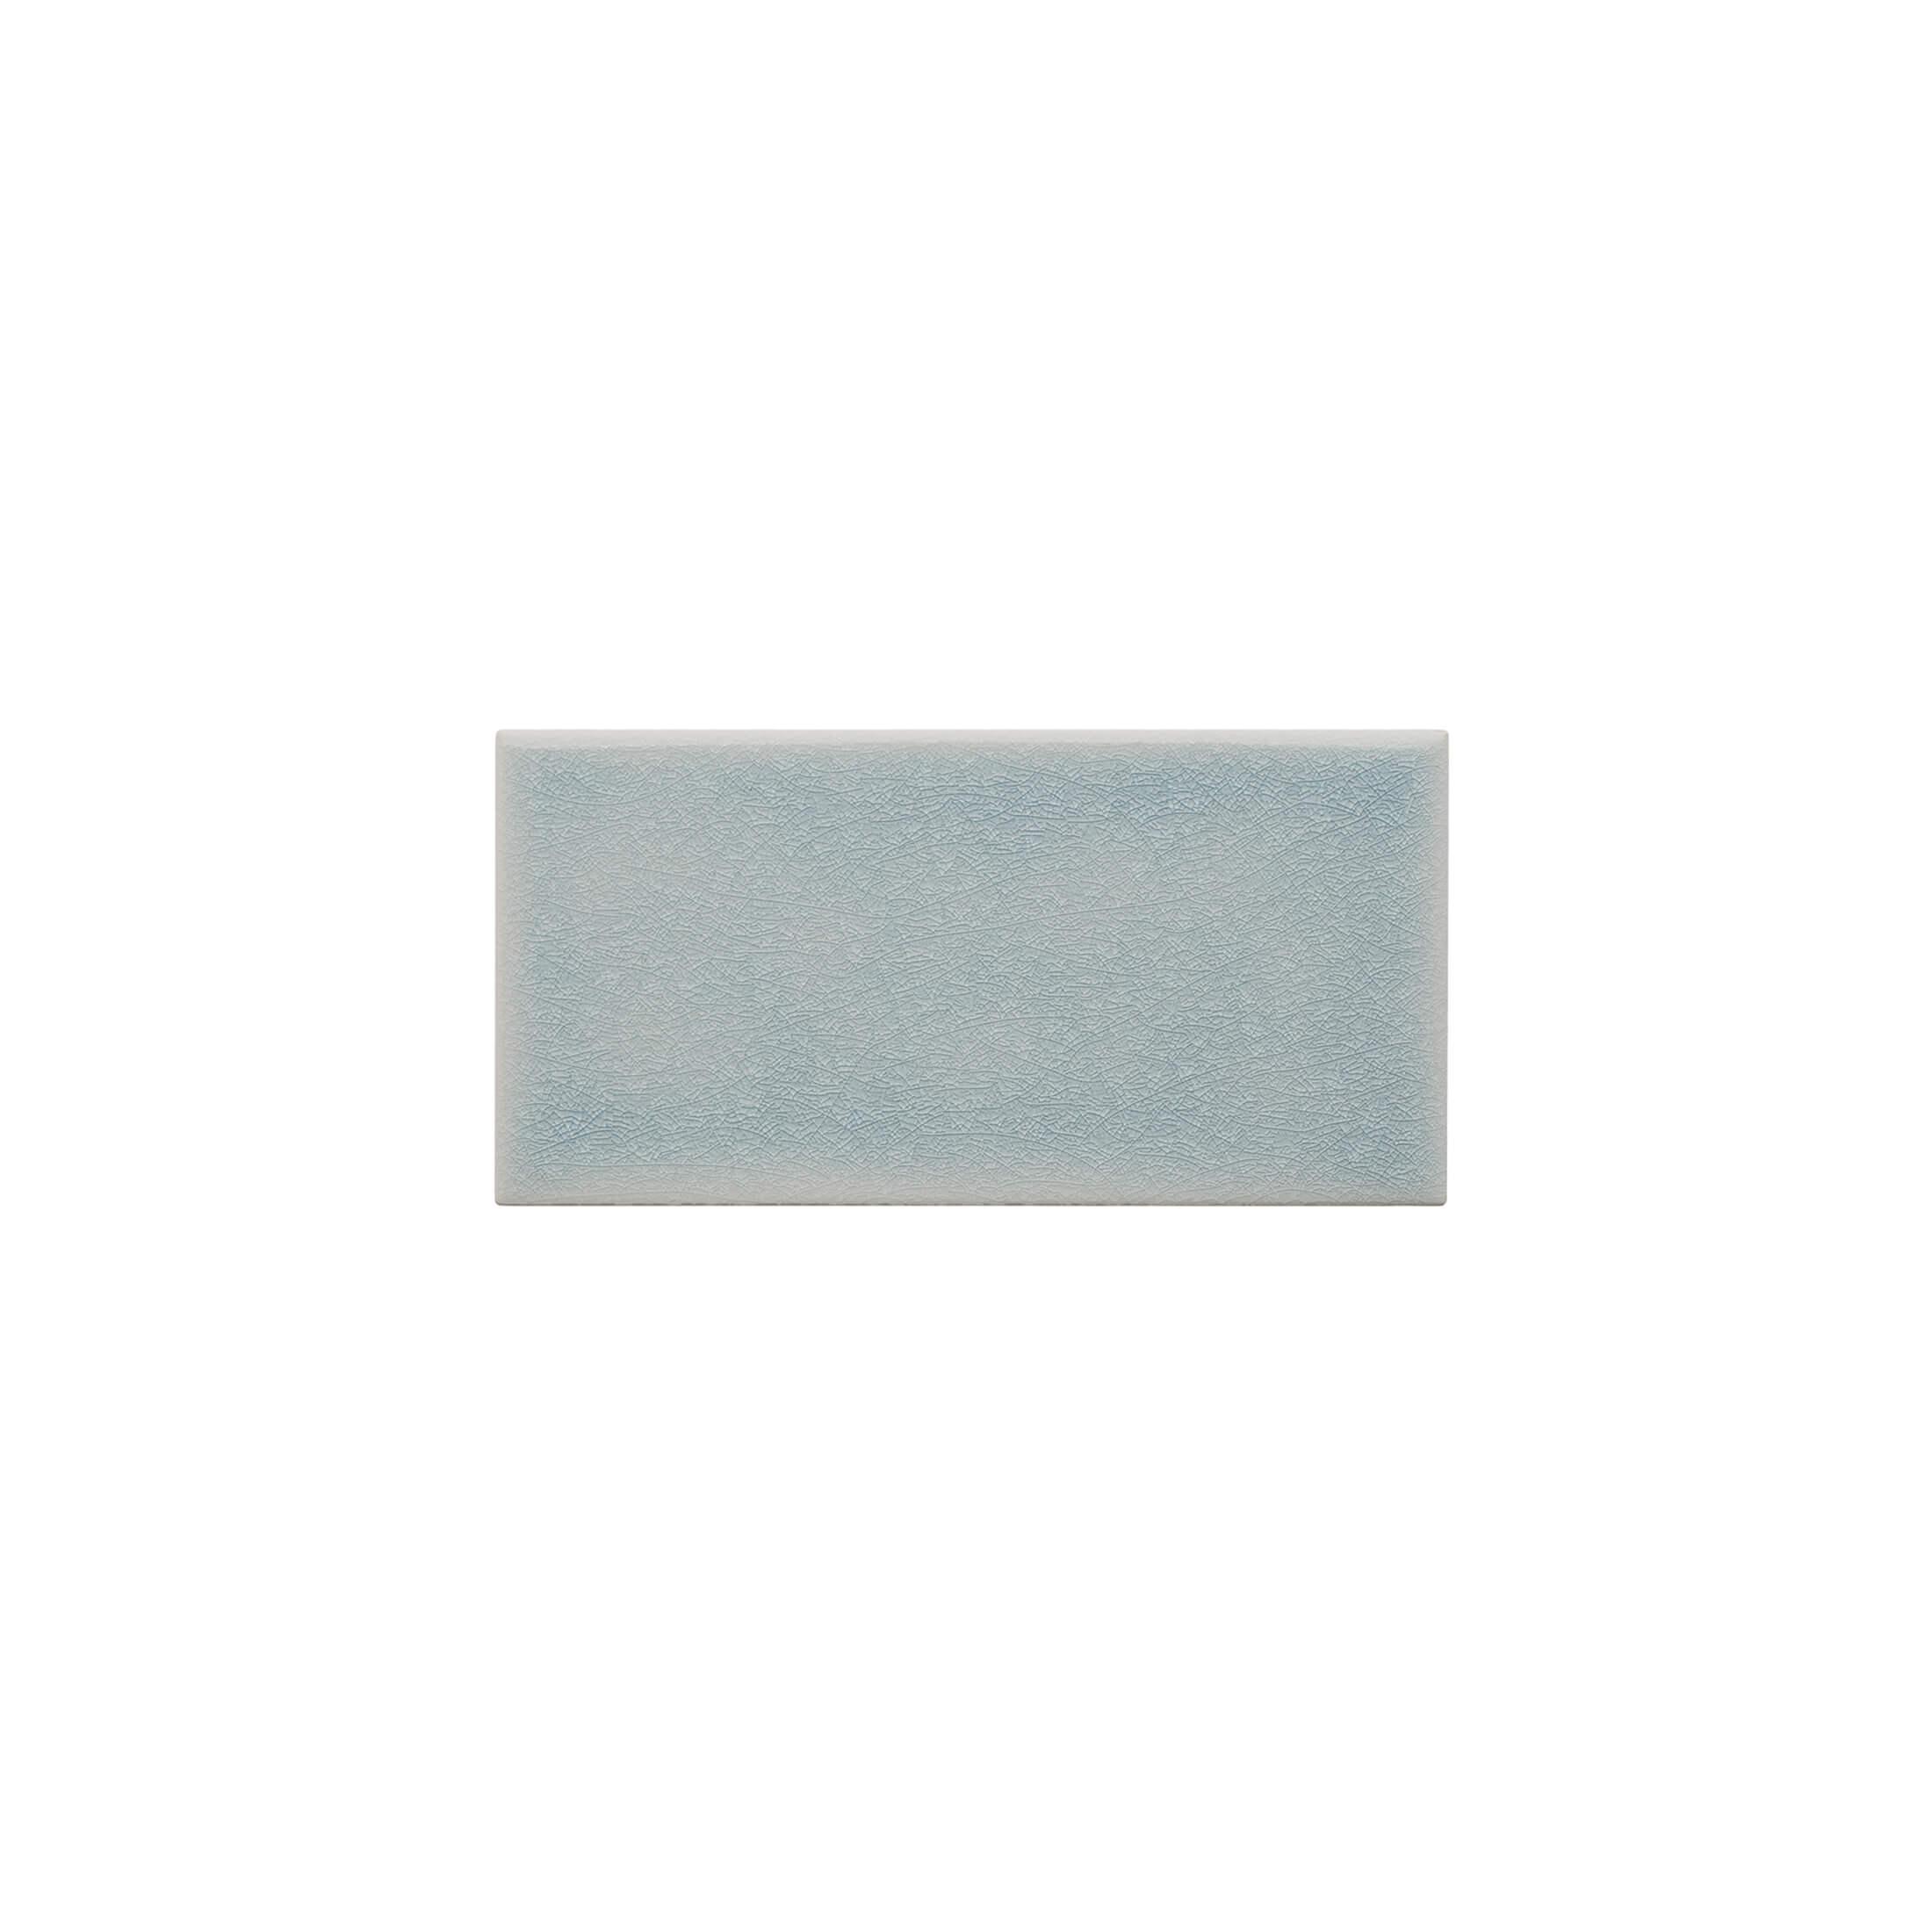 ADEX-ADOC1001-LISO--7.5 cm-15 cm-OCEAN>TOP SAIL